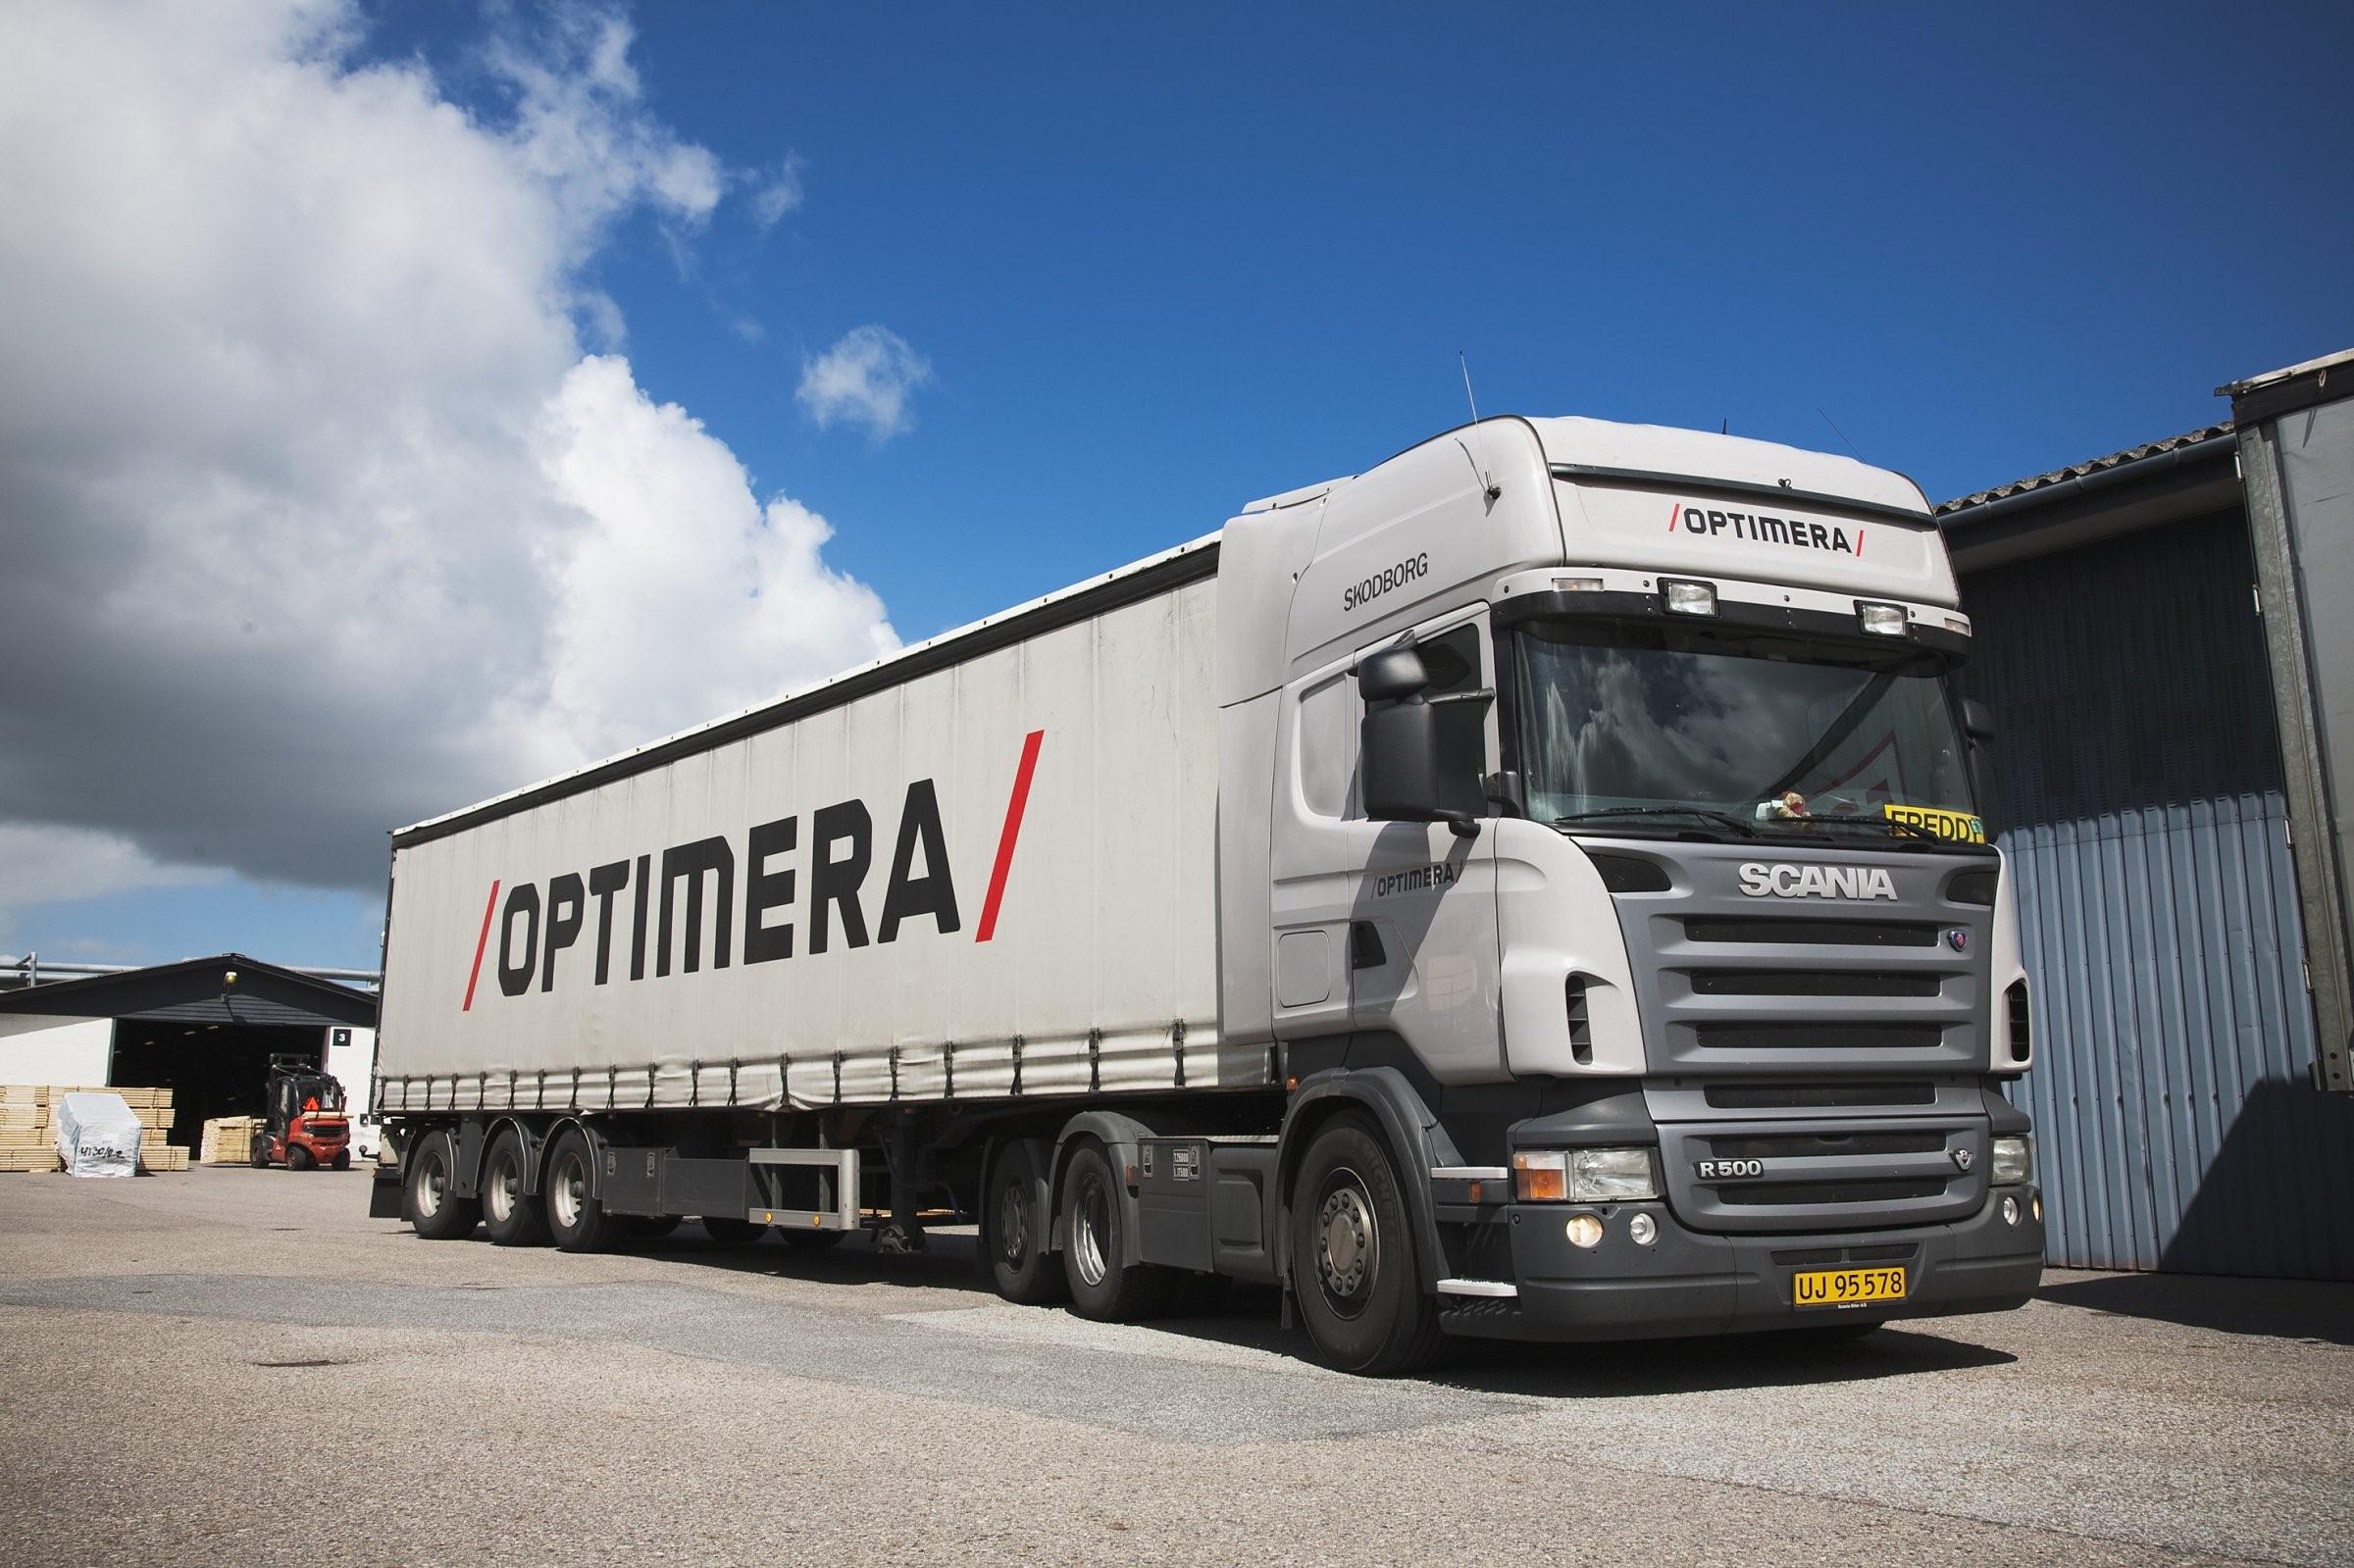 Ny Optimera vil samle hovedstaden - RetailNews